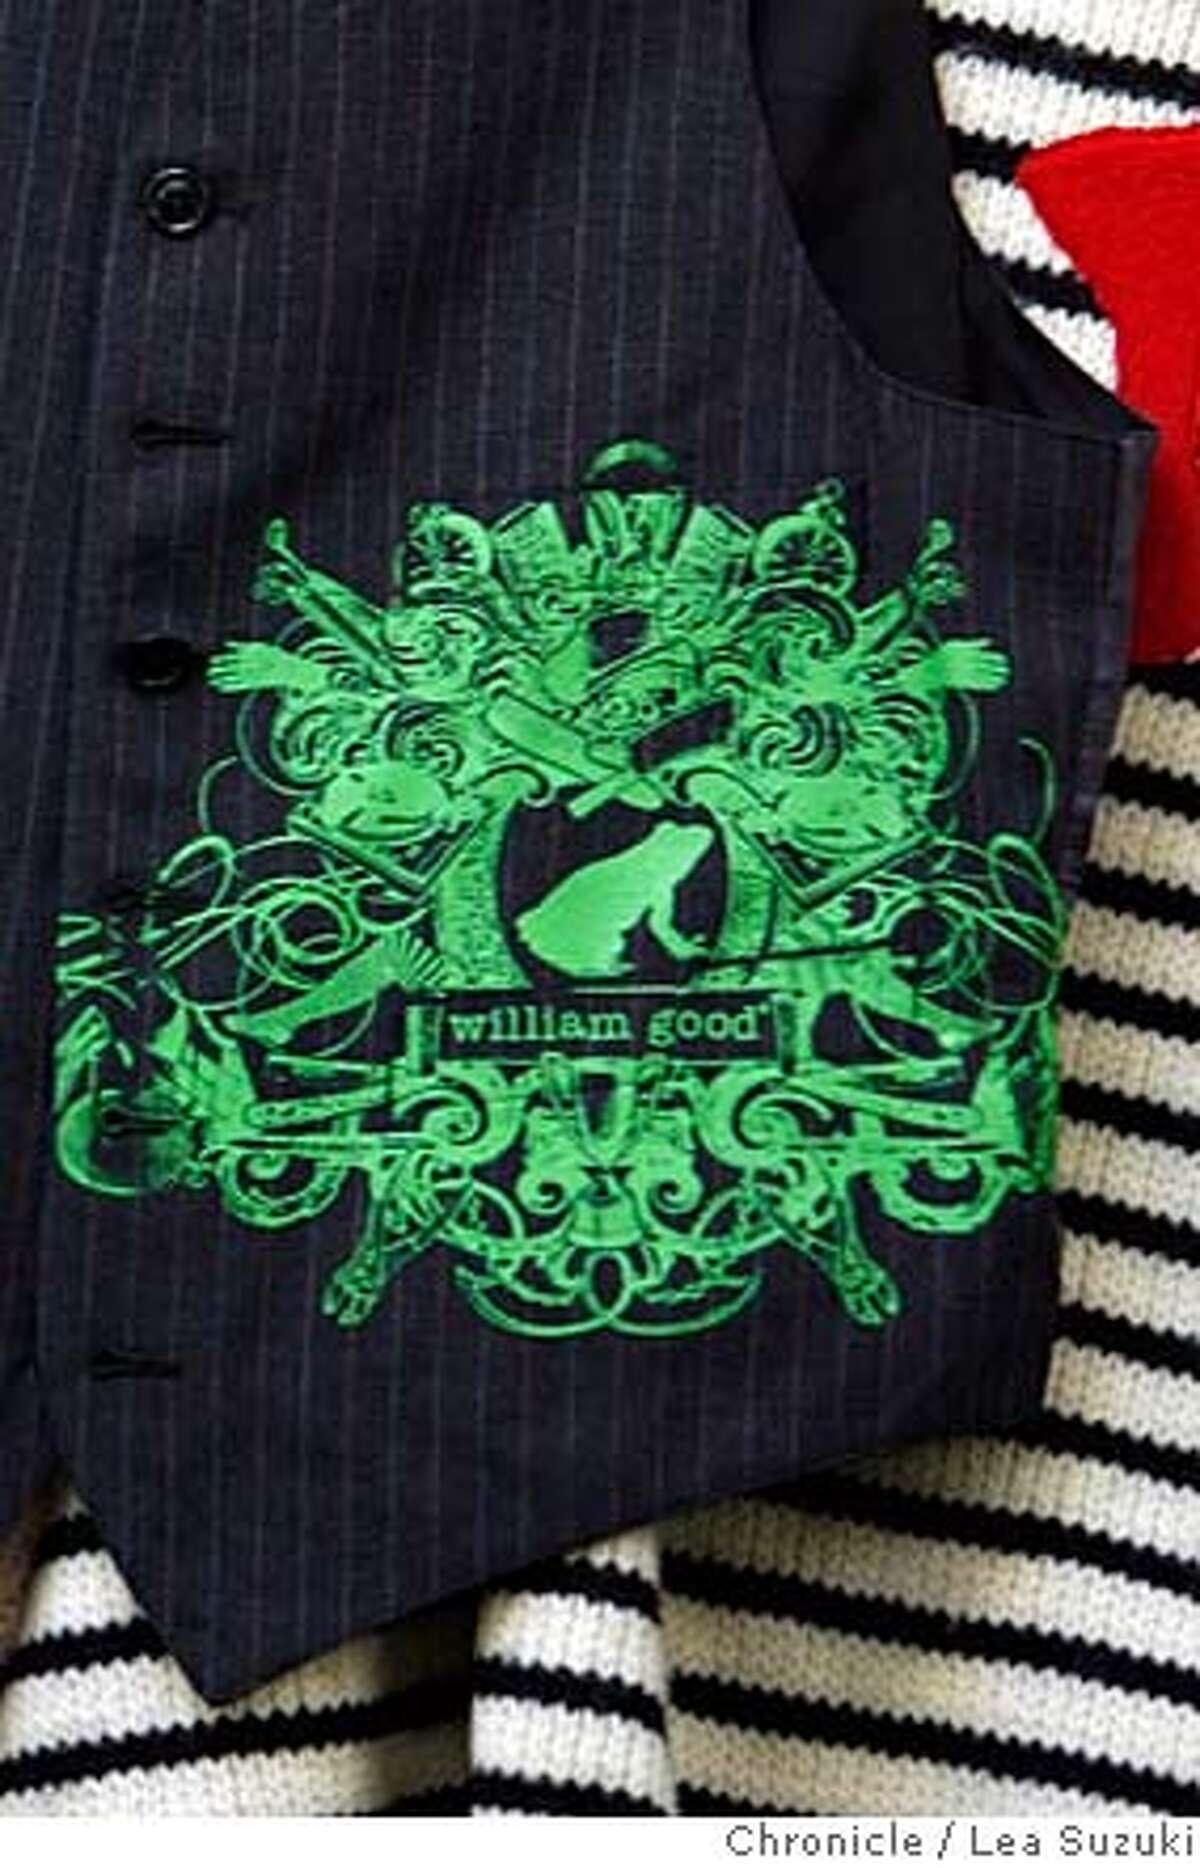 good21_136_ls.jpg A William Good silkscreen design on a vest. William Good's production facility where designers